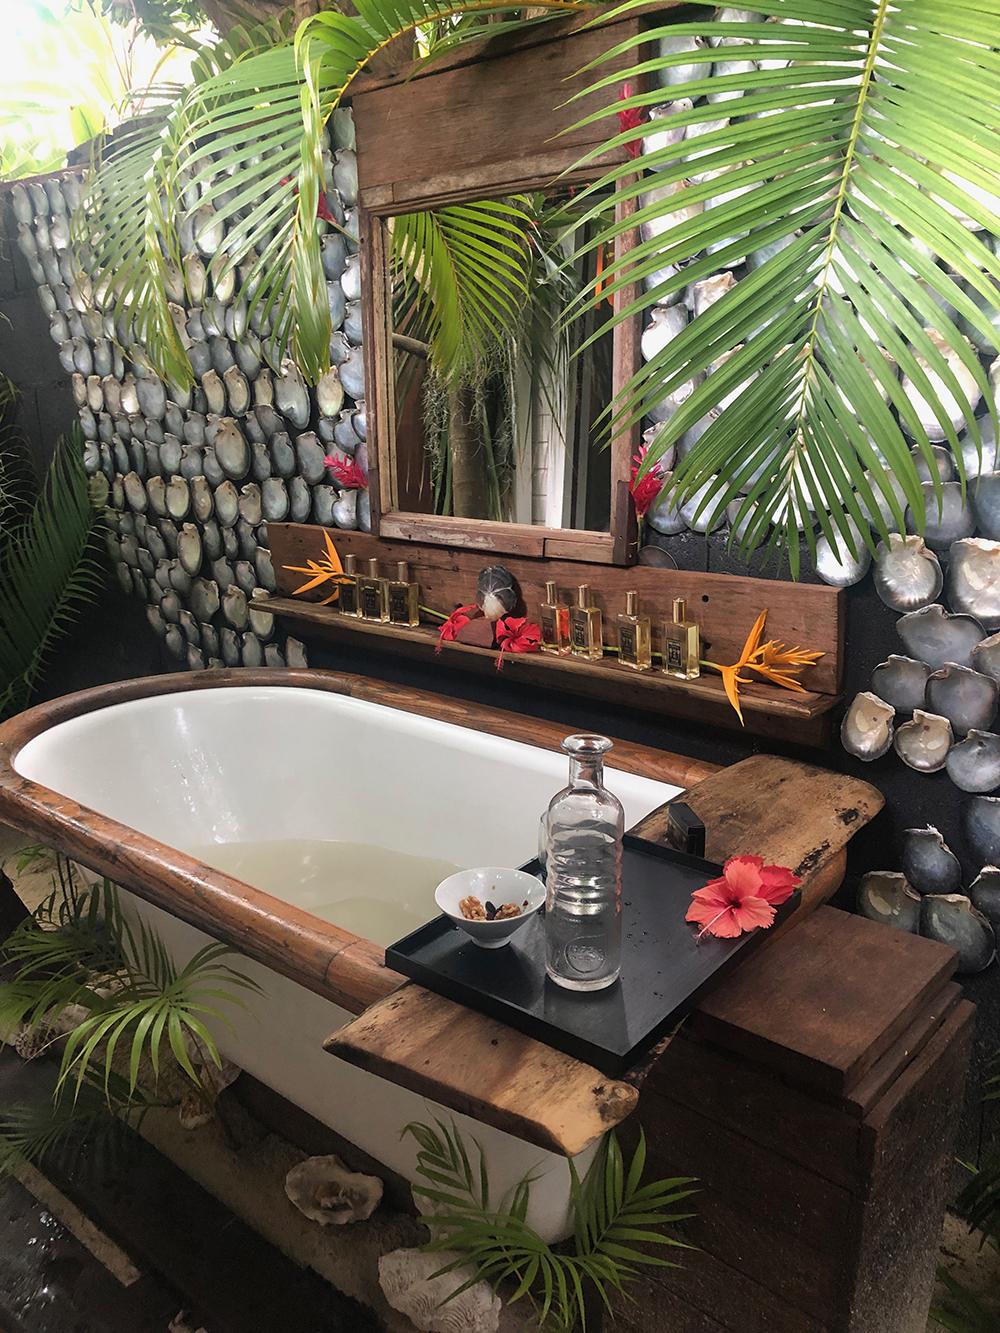 The Zen Garden area features a stunning open-air bath tub.